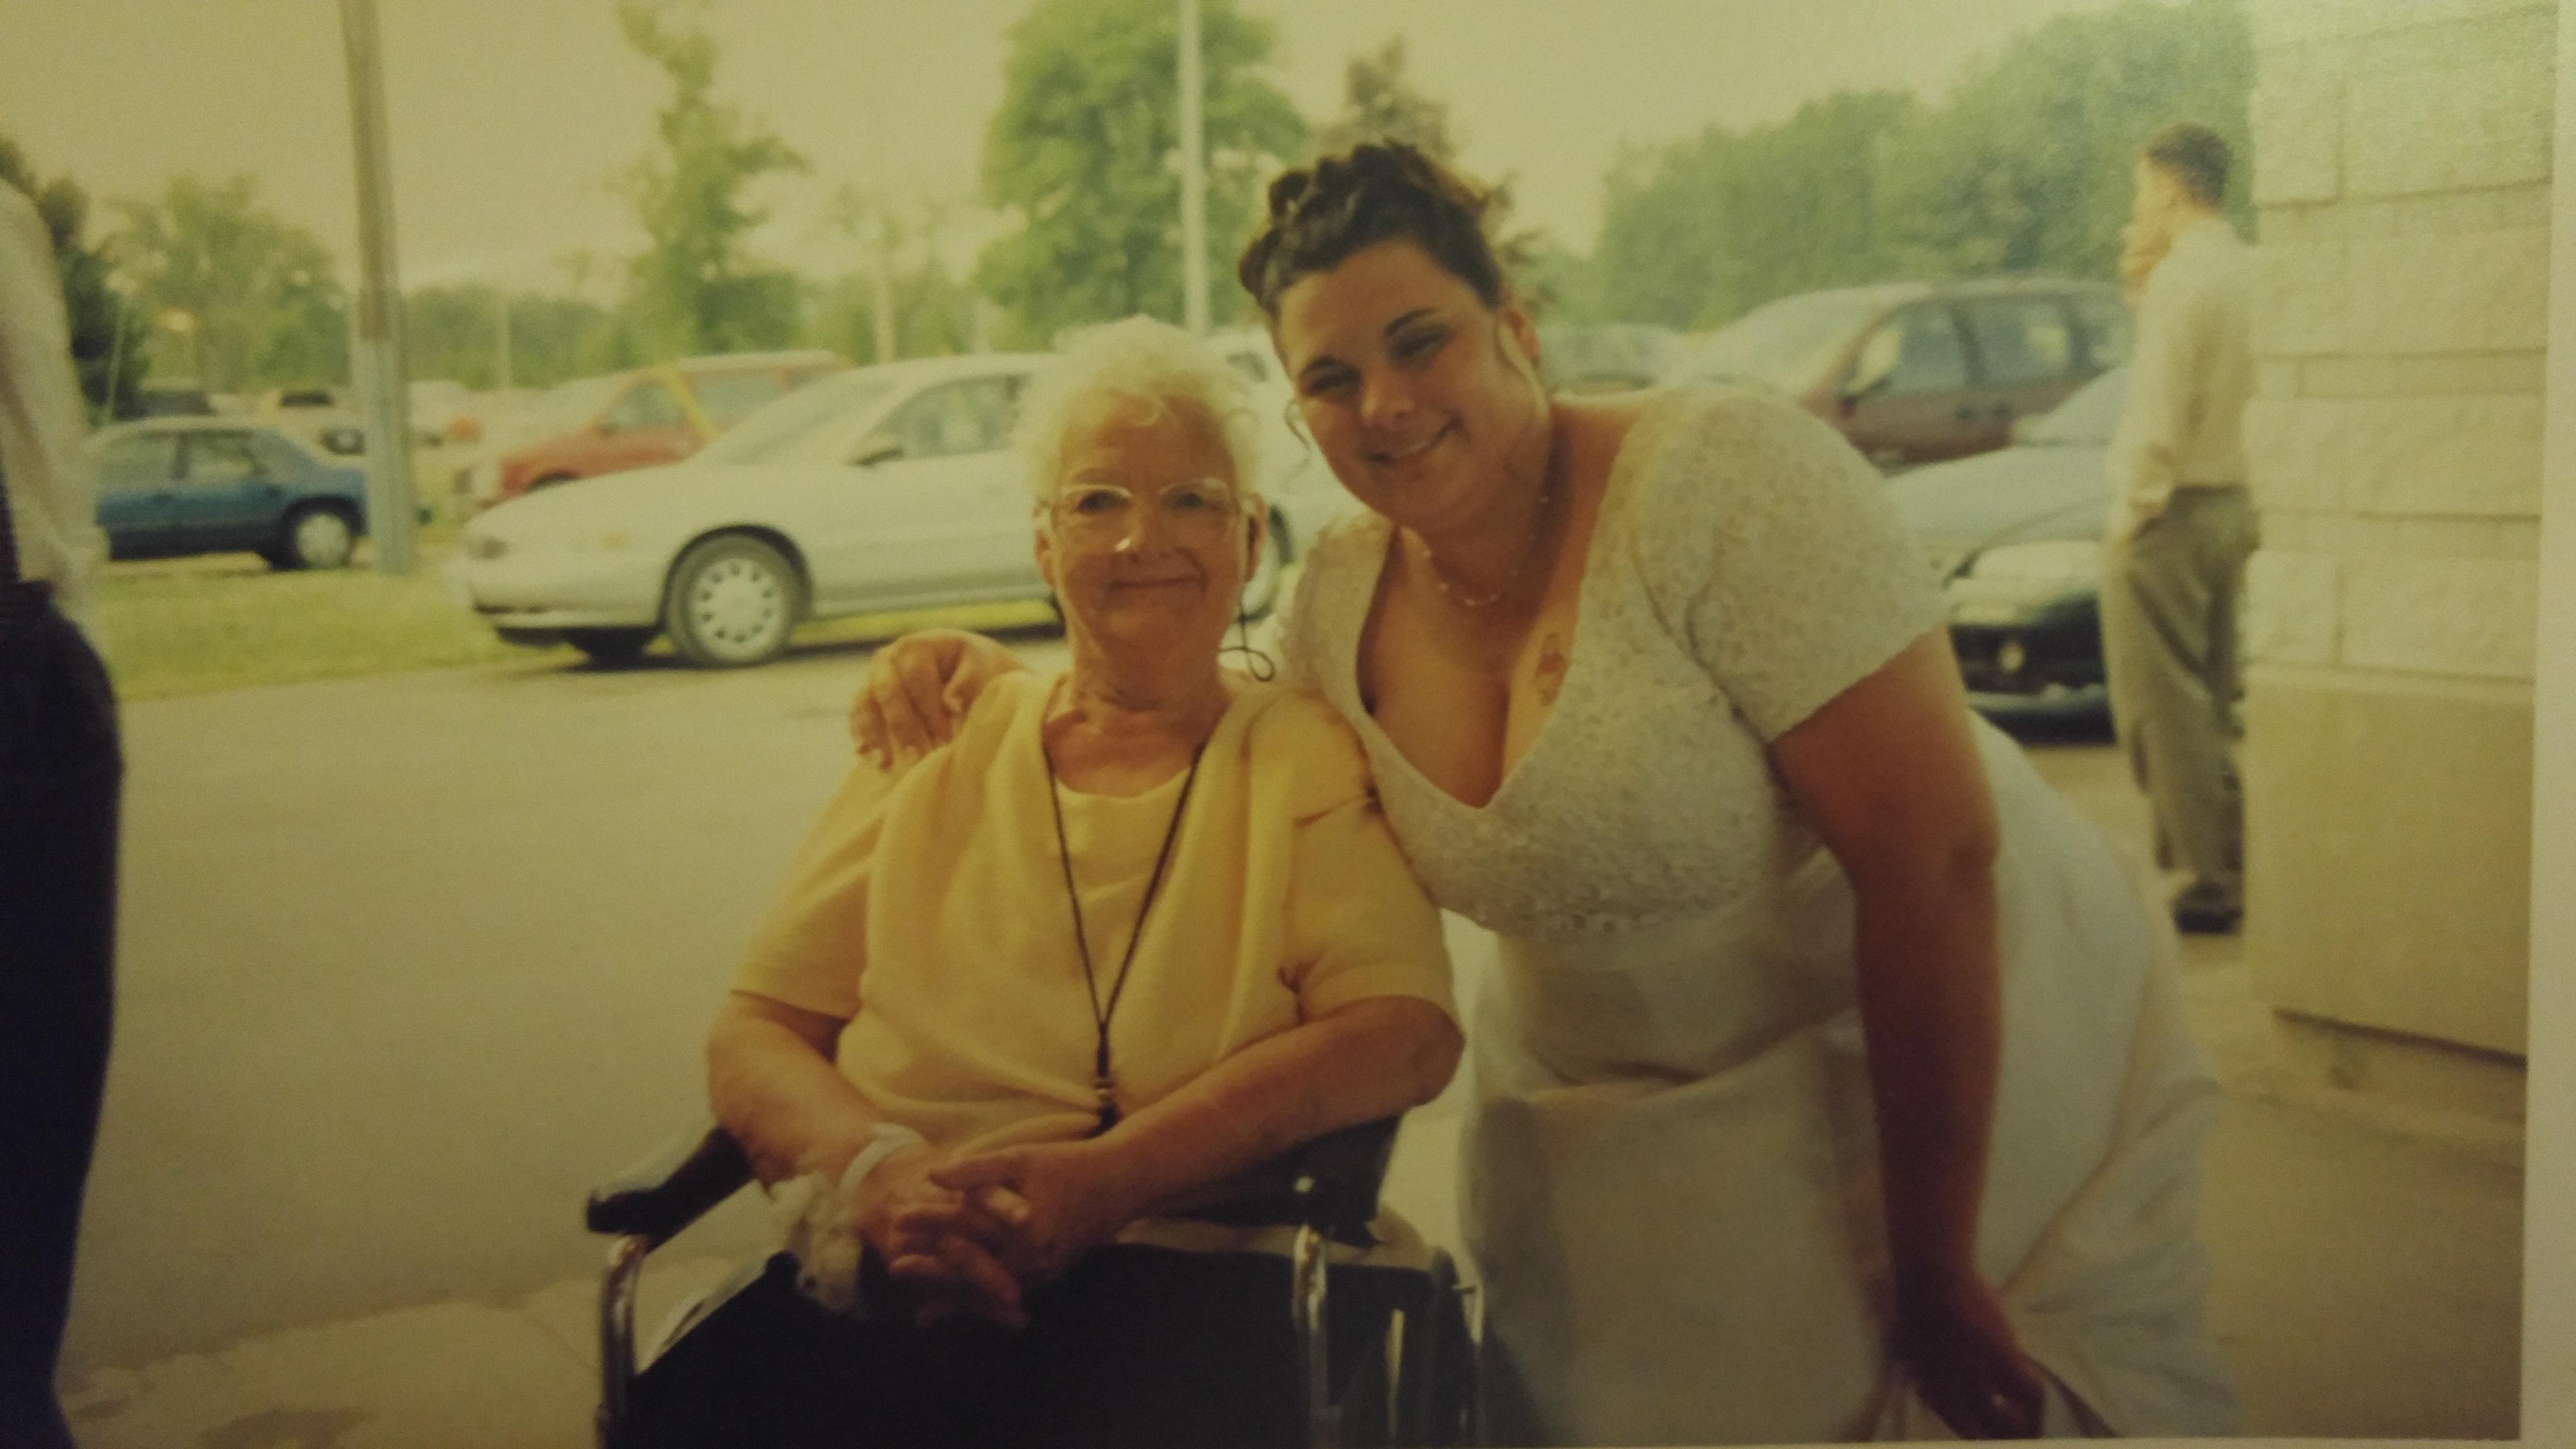 Obituary for Rhonda Jane Mary Peters (Photo album)